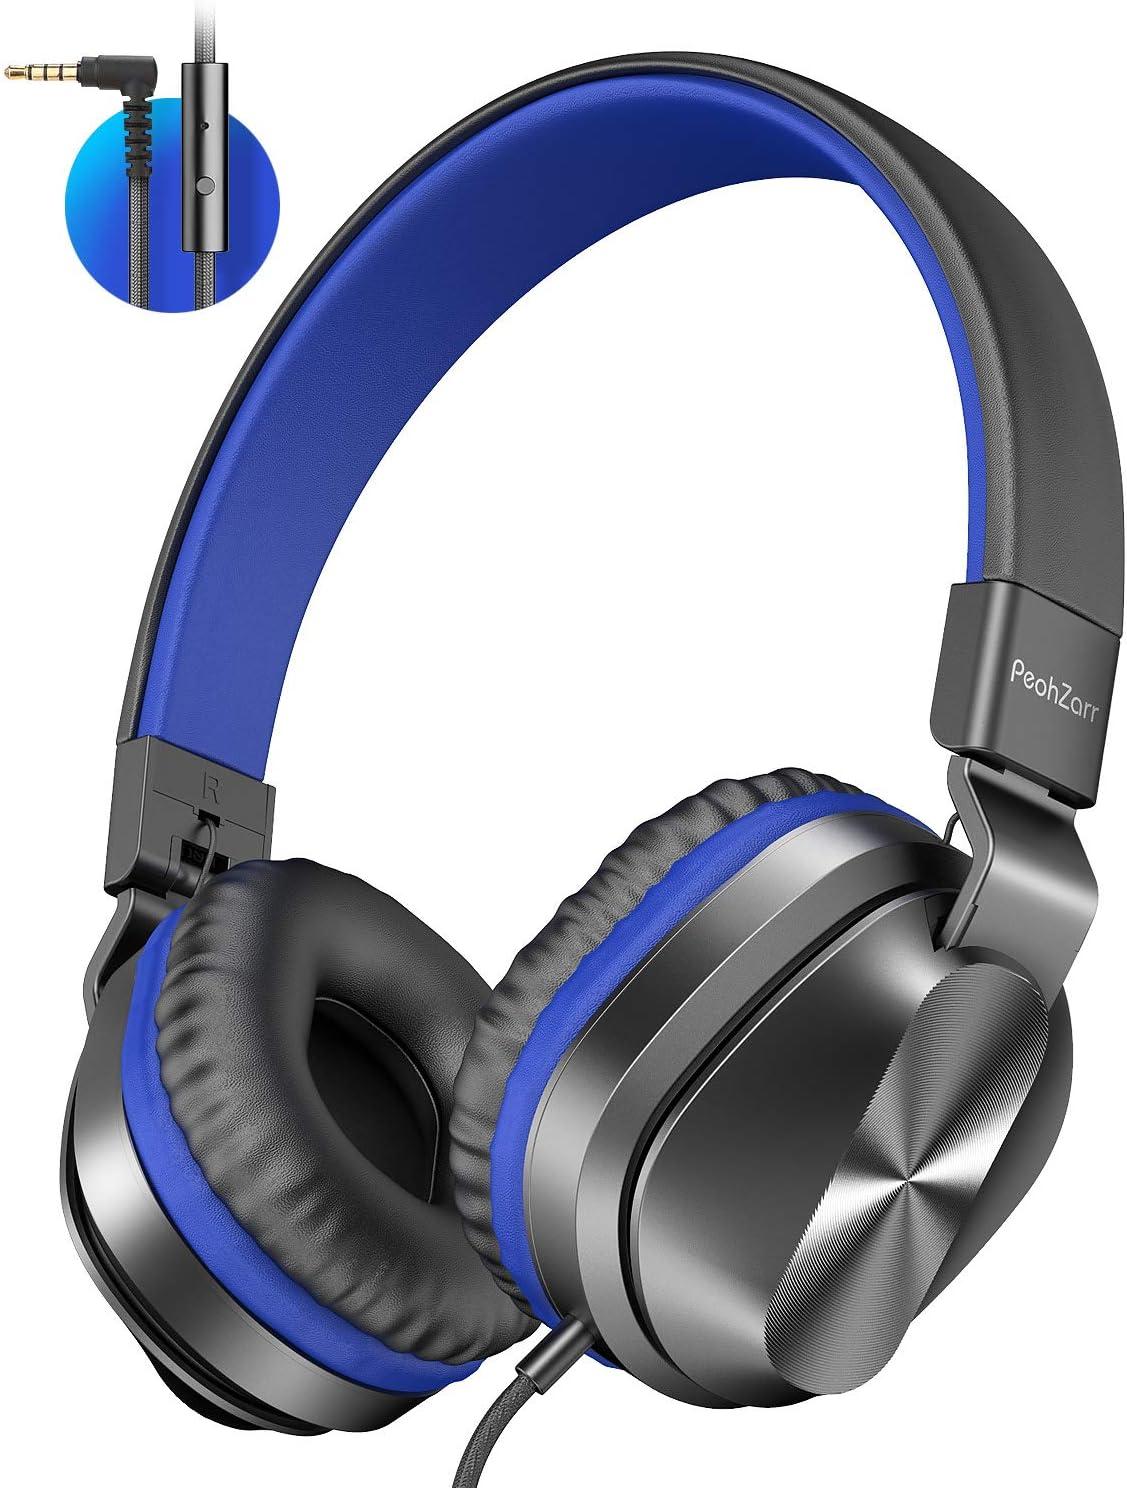 PeohZarr Kinder Kopfh/örer mit Mikrofon Laptop MP3//4 iPad Faltbar Leicht Tablet Computer Stereo-Bass-Kinderkopfh/örer mit 1,5 m Langem Kabel Blau Tragbare On-Ear-Kopfh/örer f/ür Smartphone